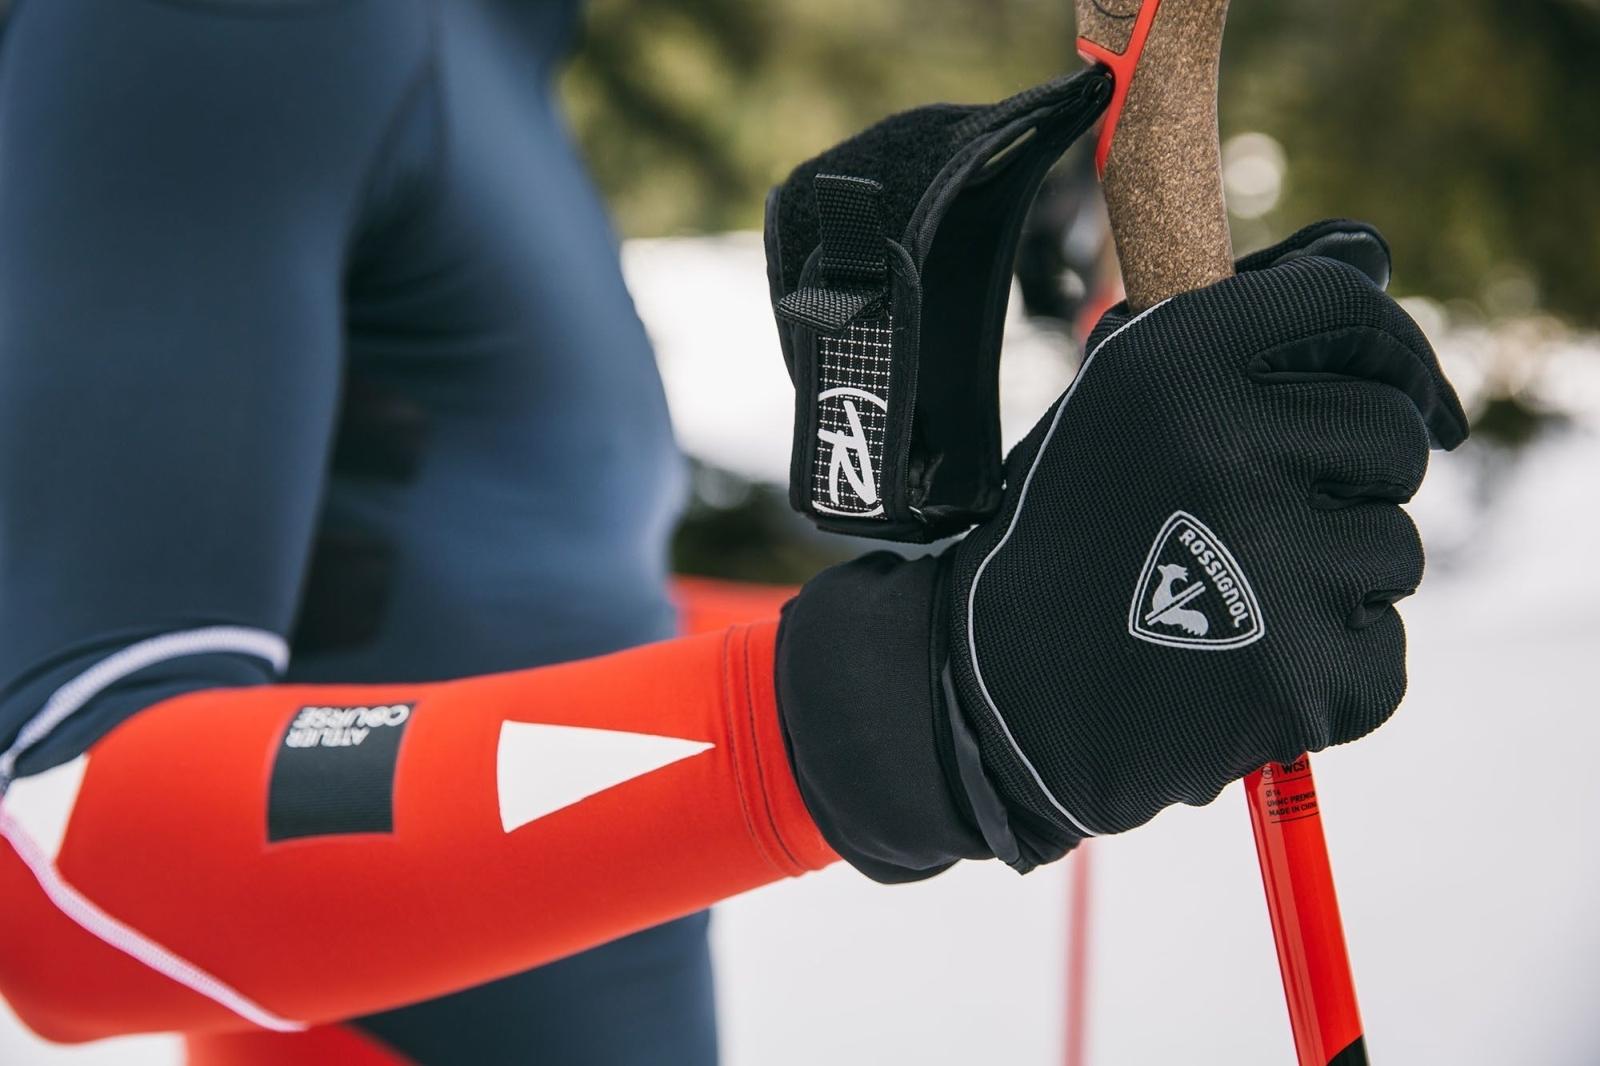 Rukavice na běžky Rossignol XC Alpha - I Tip - black - Ski a Bike ... a259b9e16b